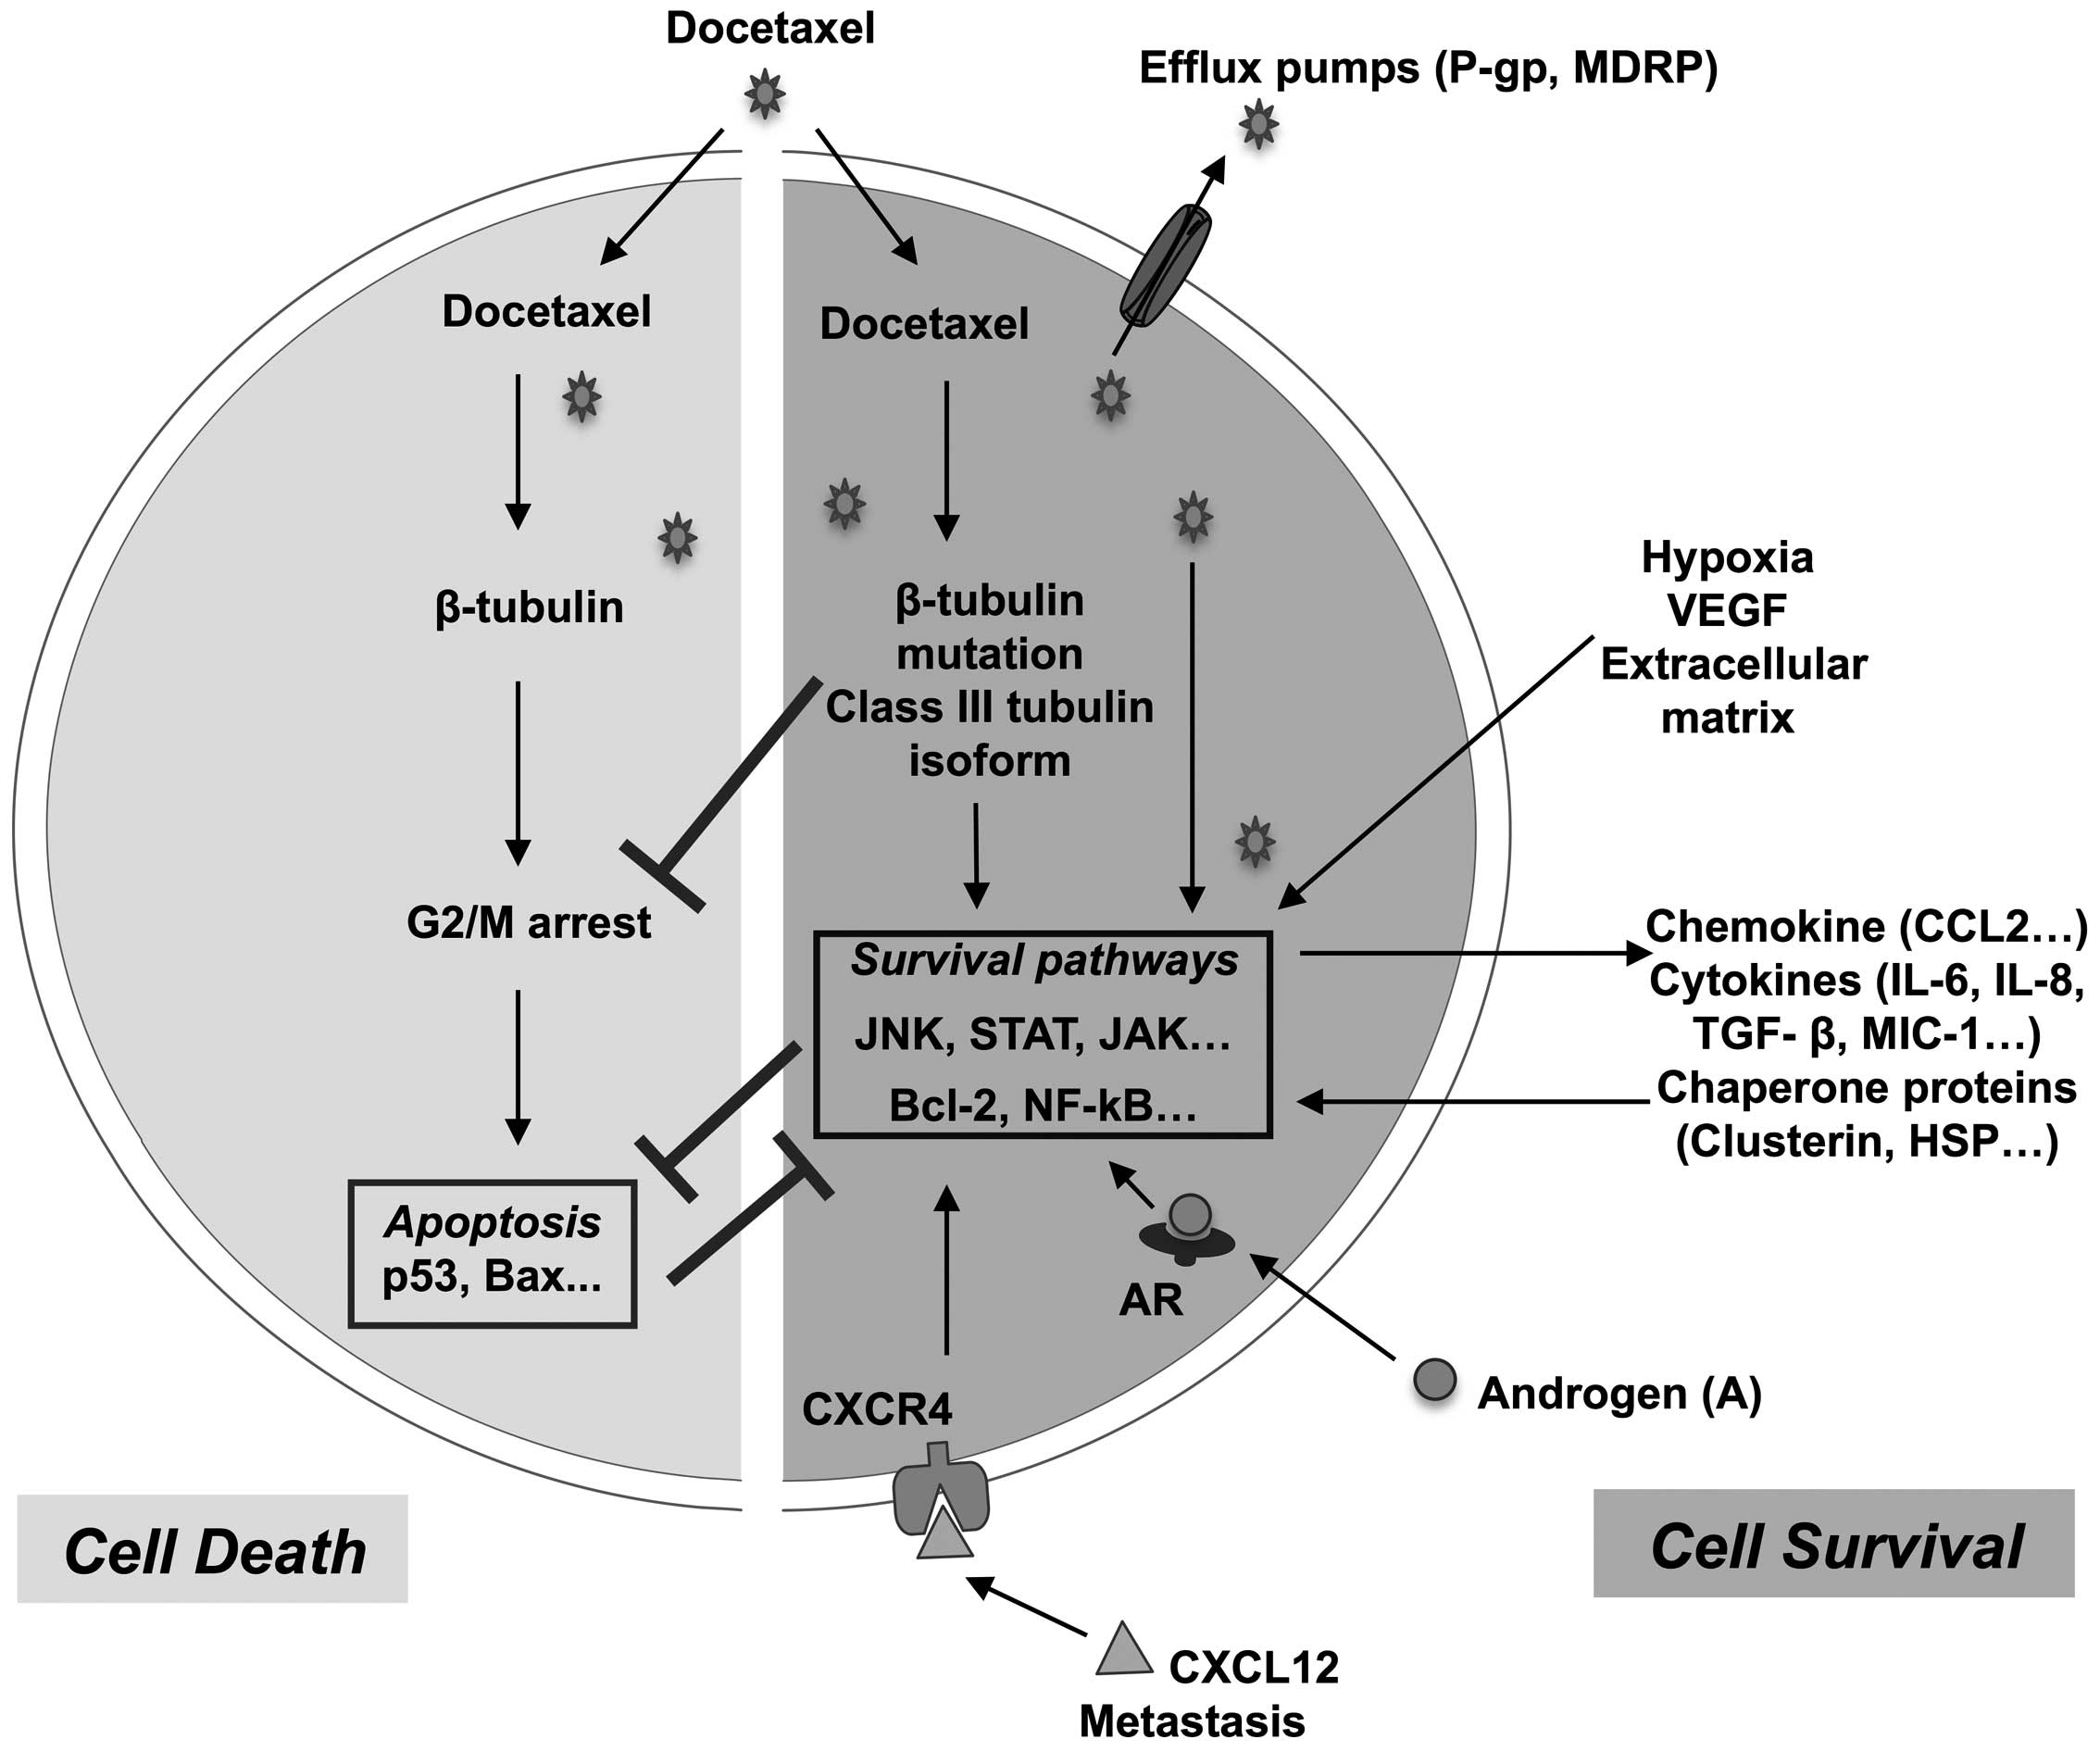 Taxotere (docetaxel) Label - FDA